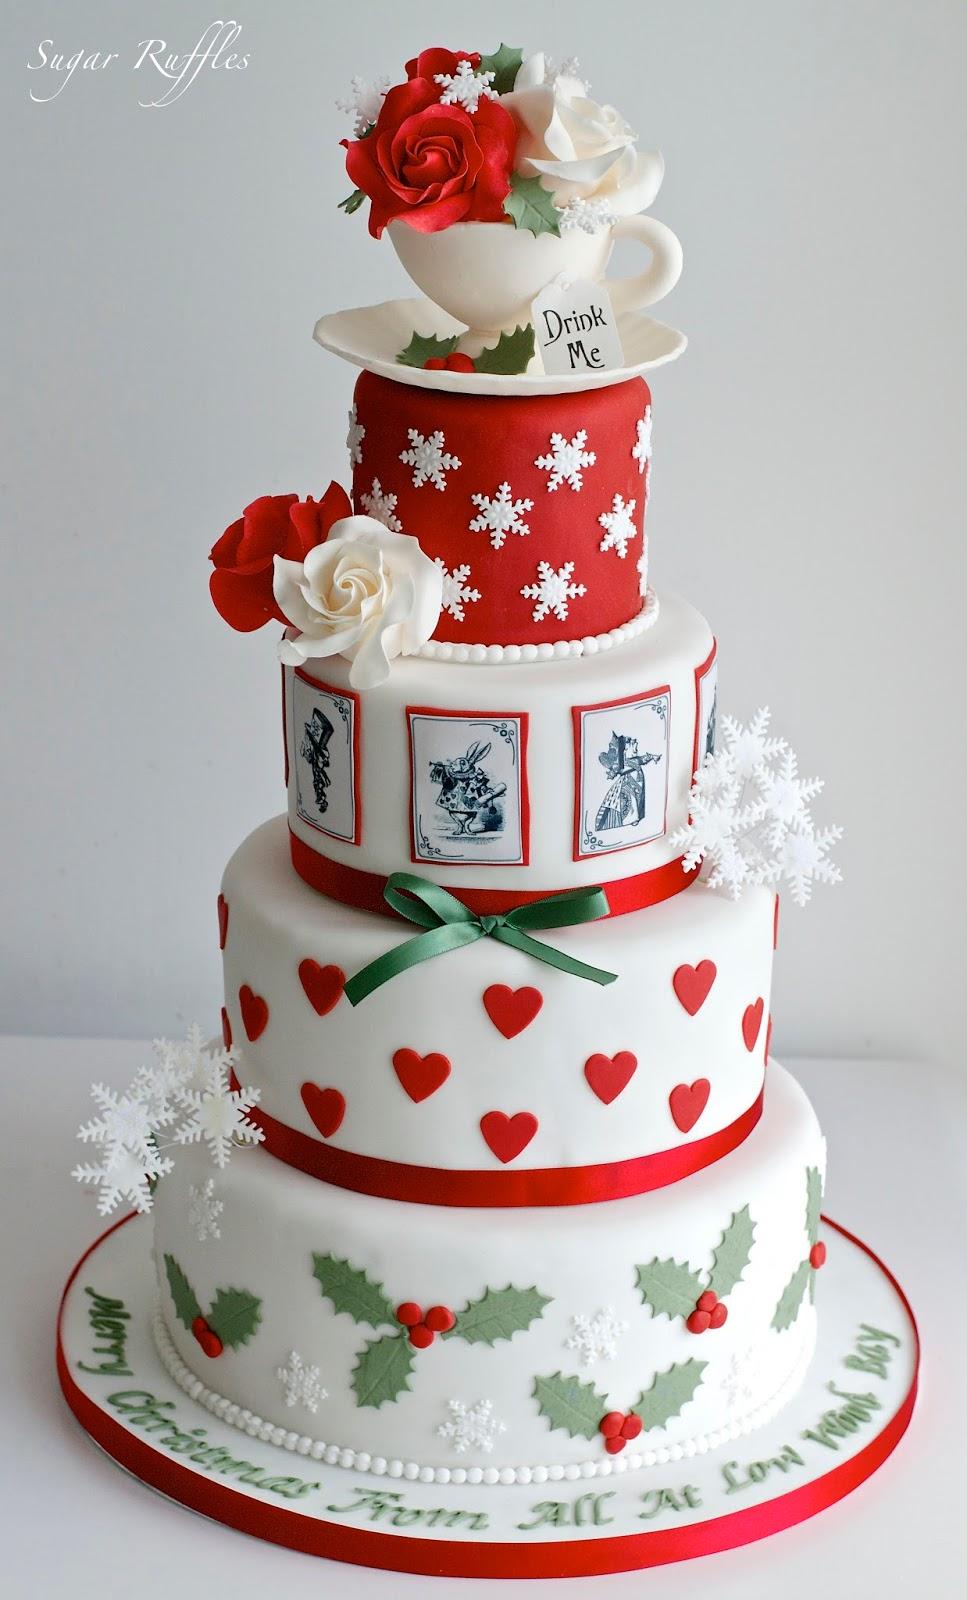 Low Wood Bay Christmas Cake 2016